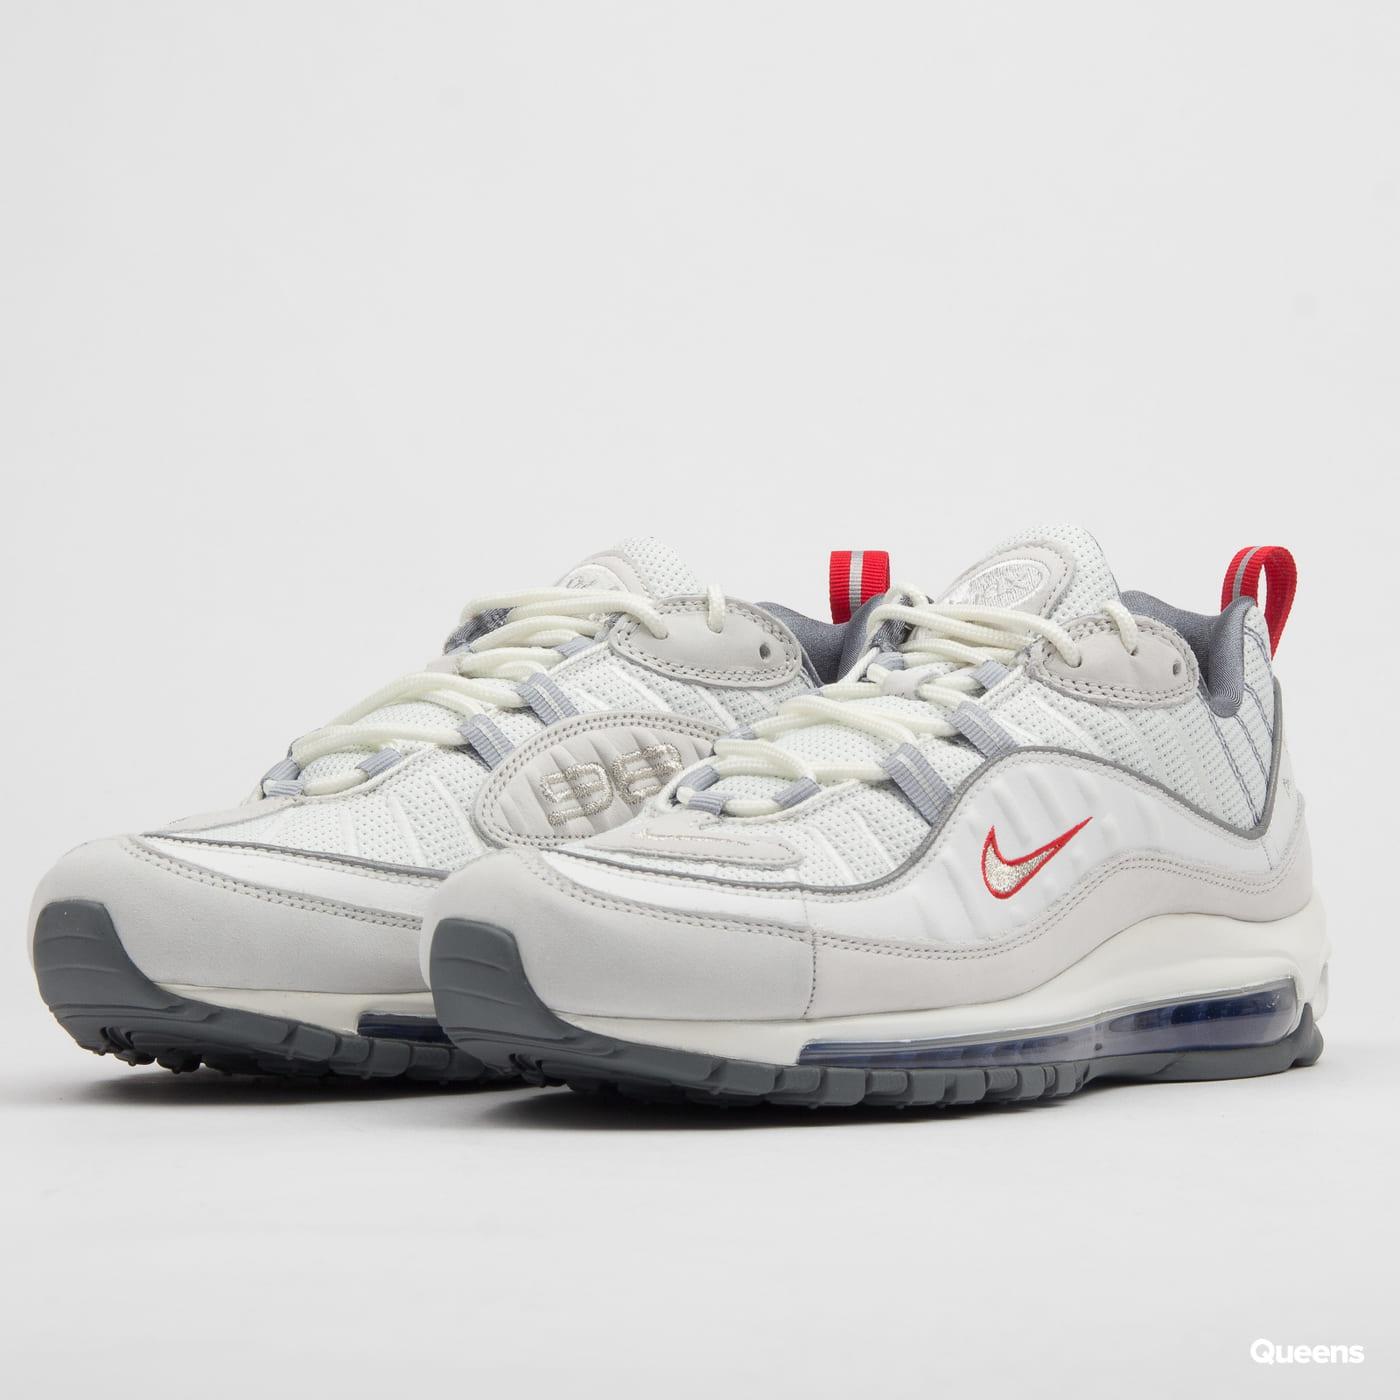 new style 78b7e 95d8c Nike Air Max 98 summit white / metallic silver